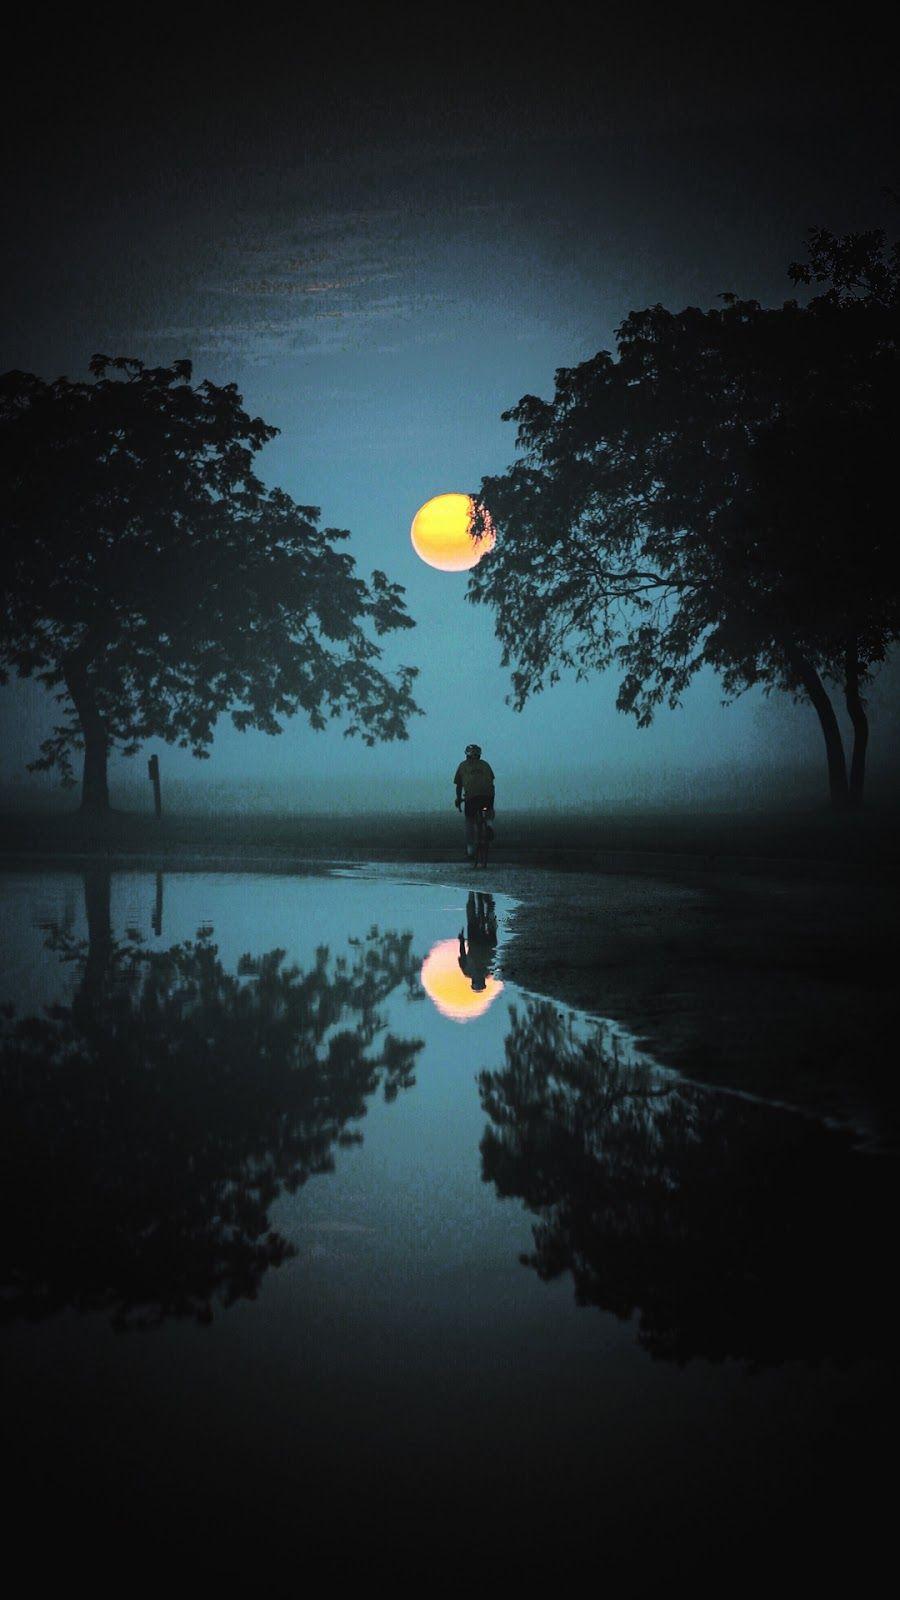 Full Moon Reflection Wallpaper Iphone Android 風景 景色 夜空